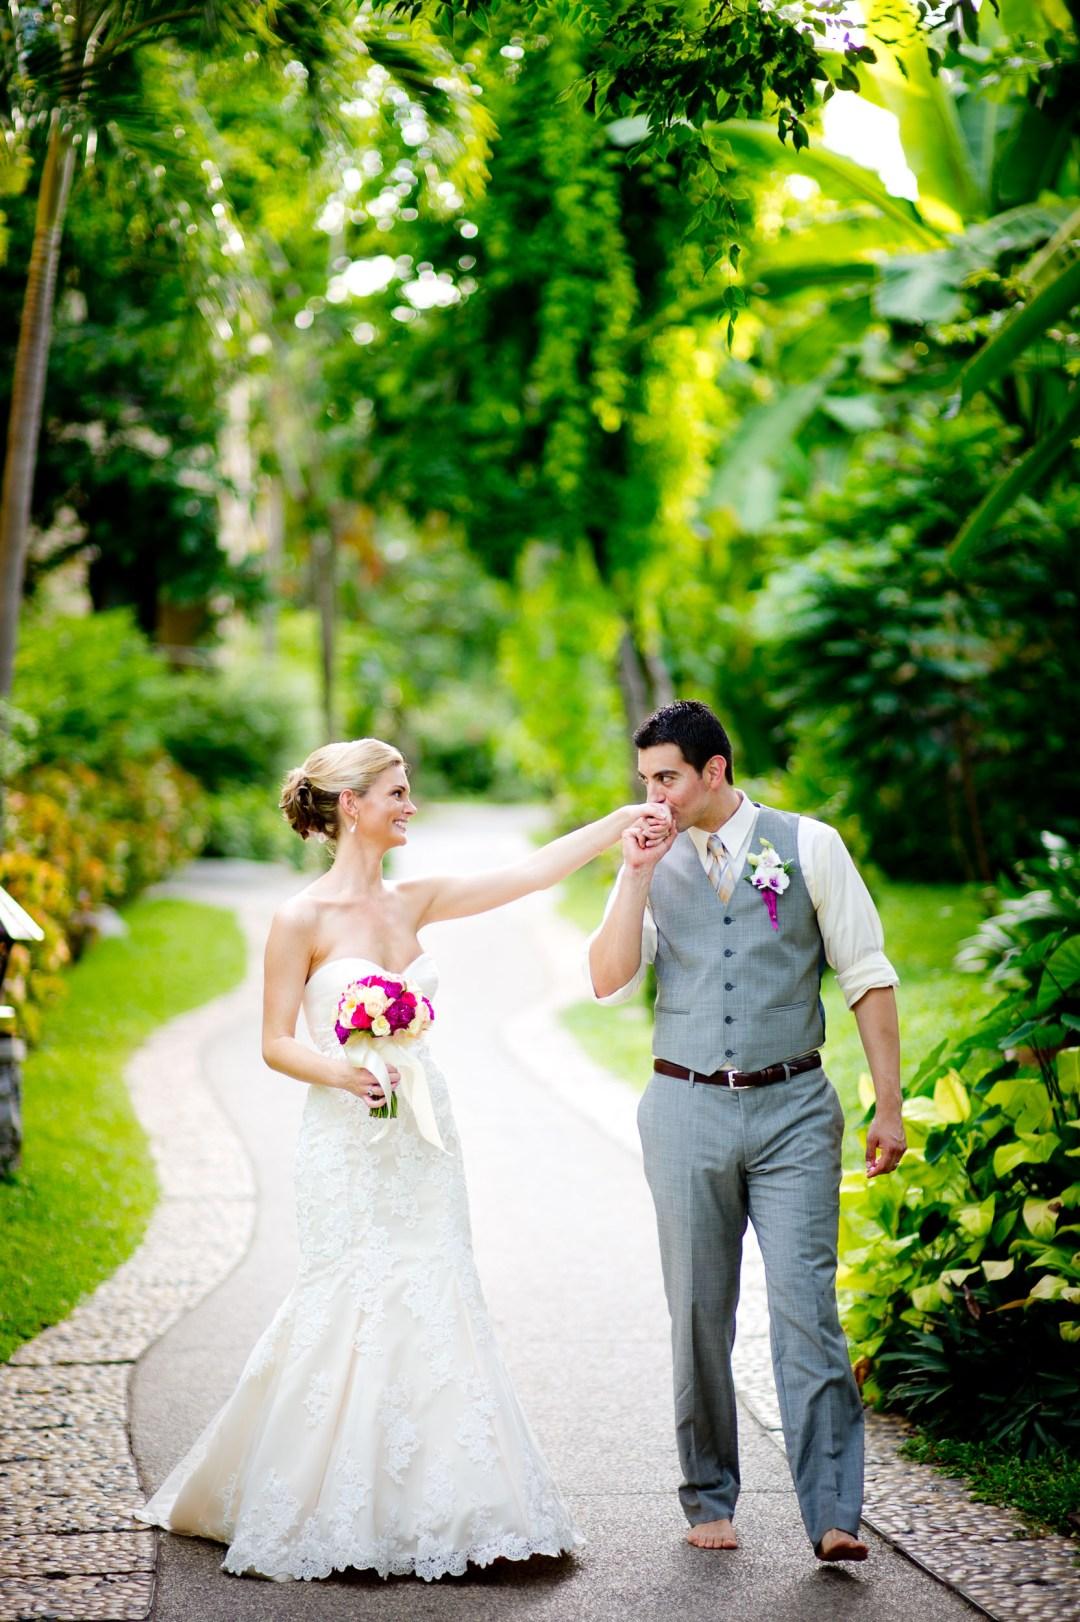 Nora Beach Resort & Spa Wedding | Koh Samui Thailand Wedding Photography